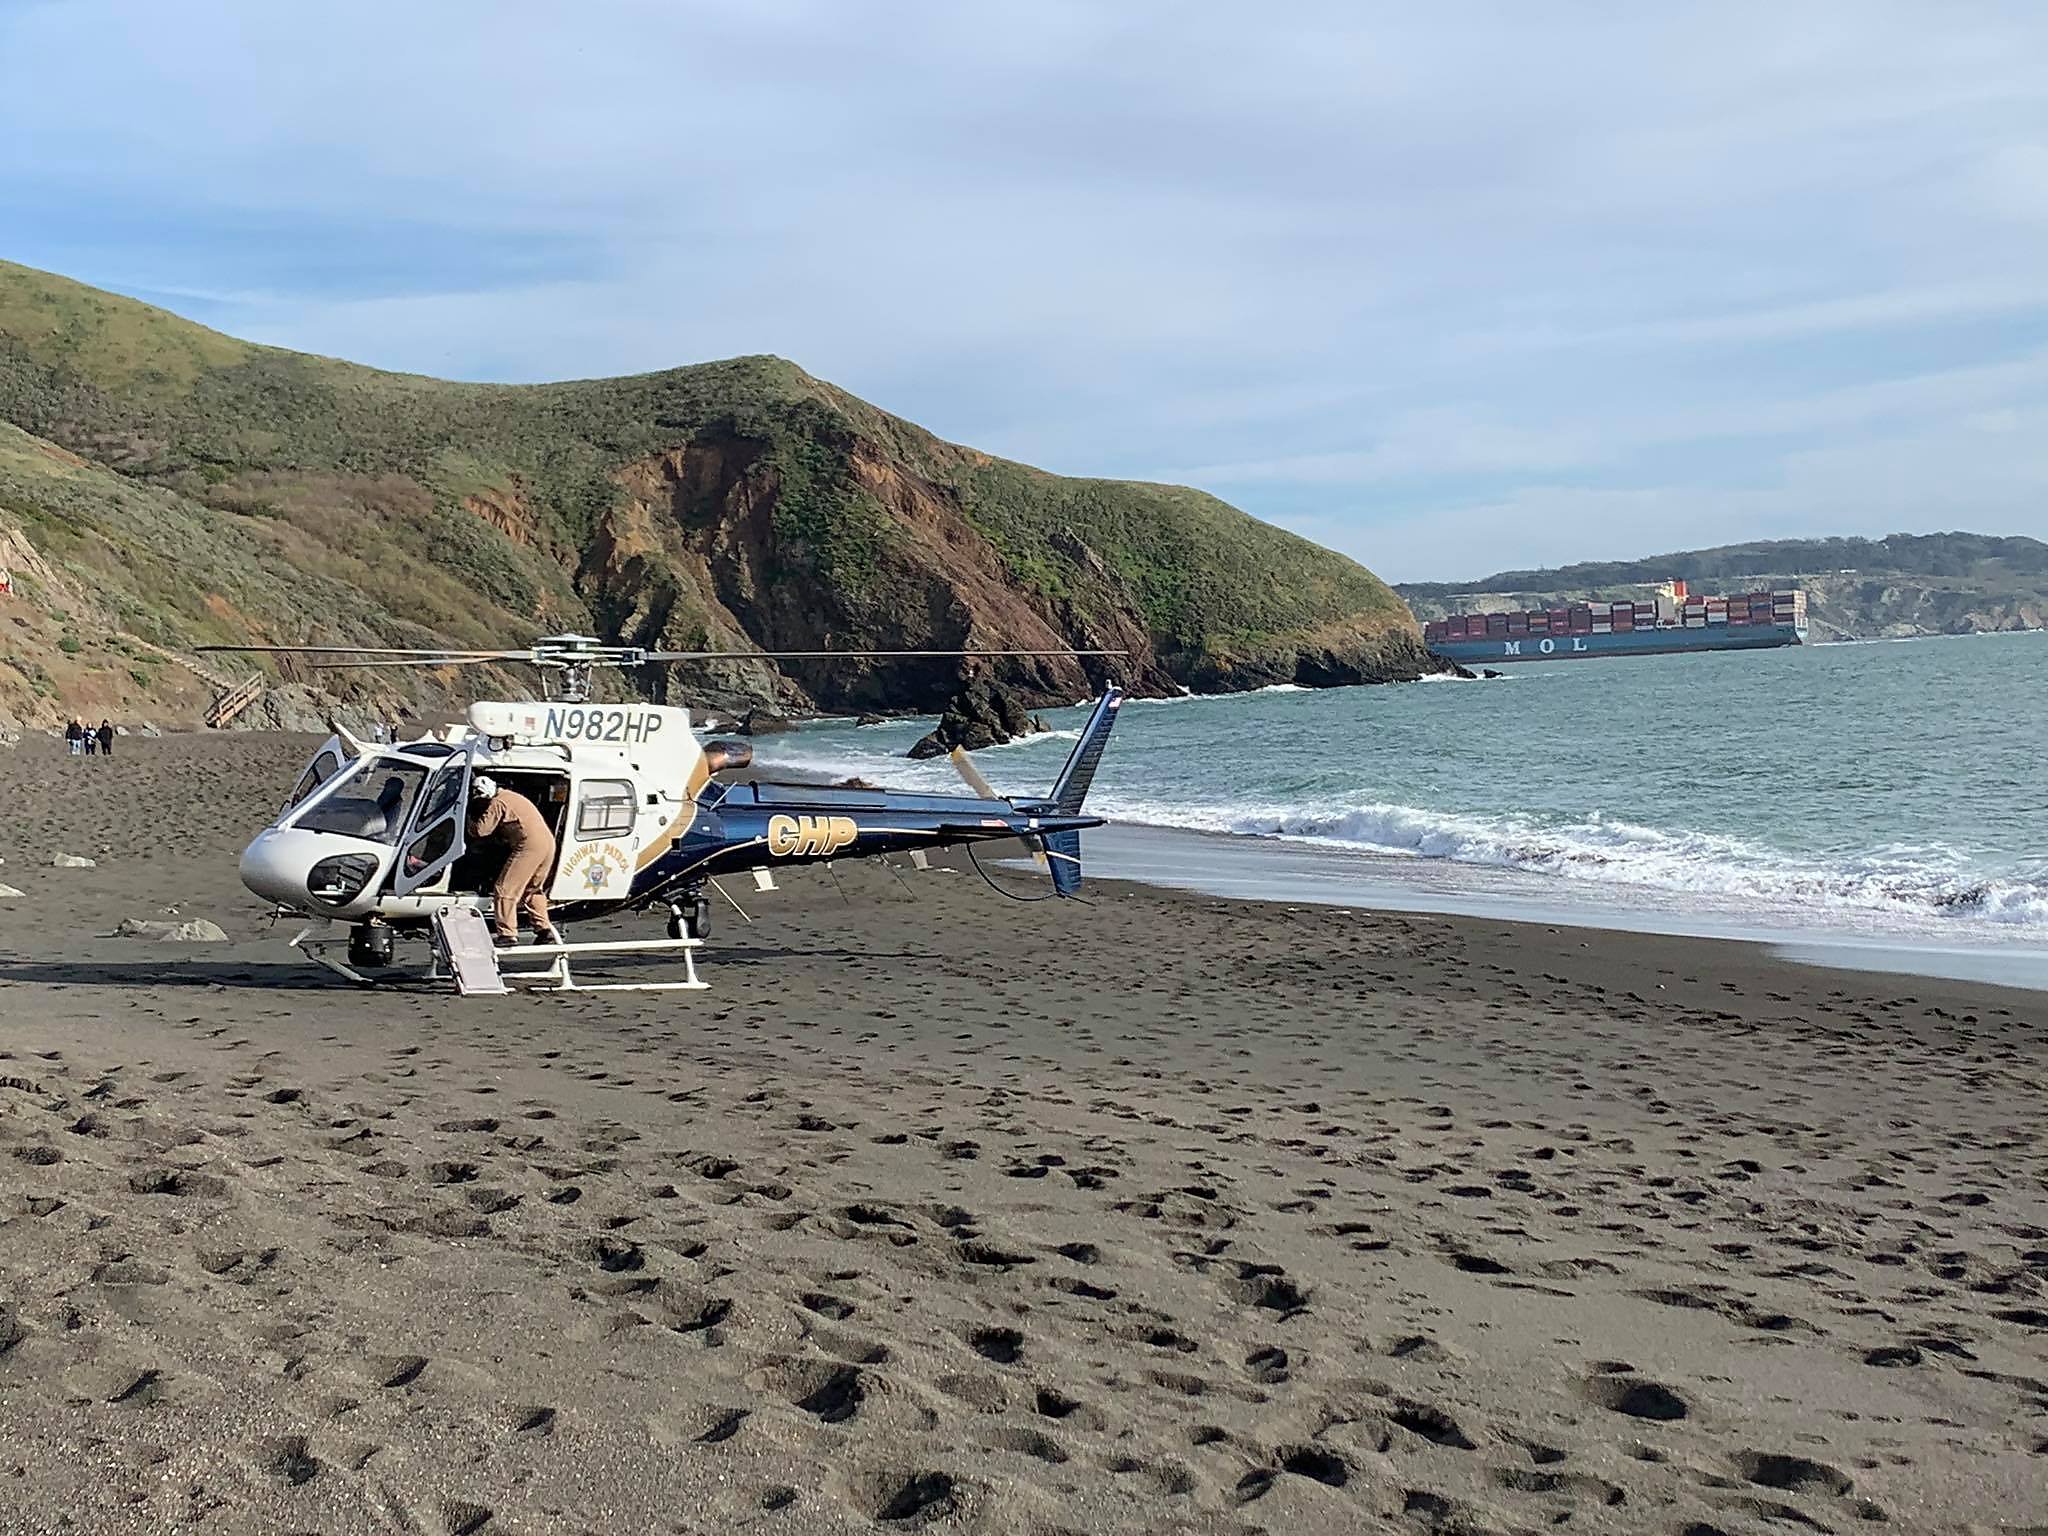 Man injured after plummeting down cliff in Marin Headlands